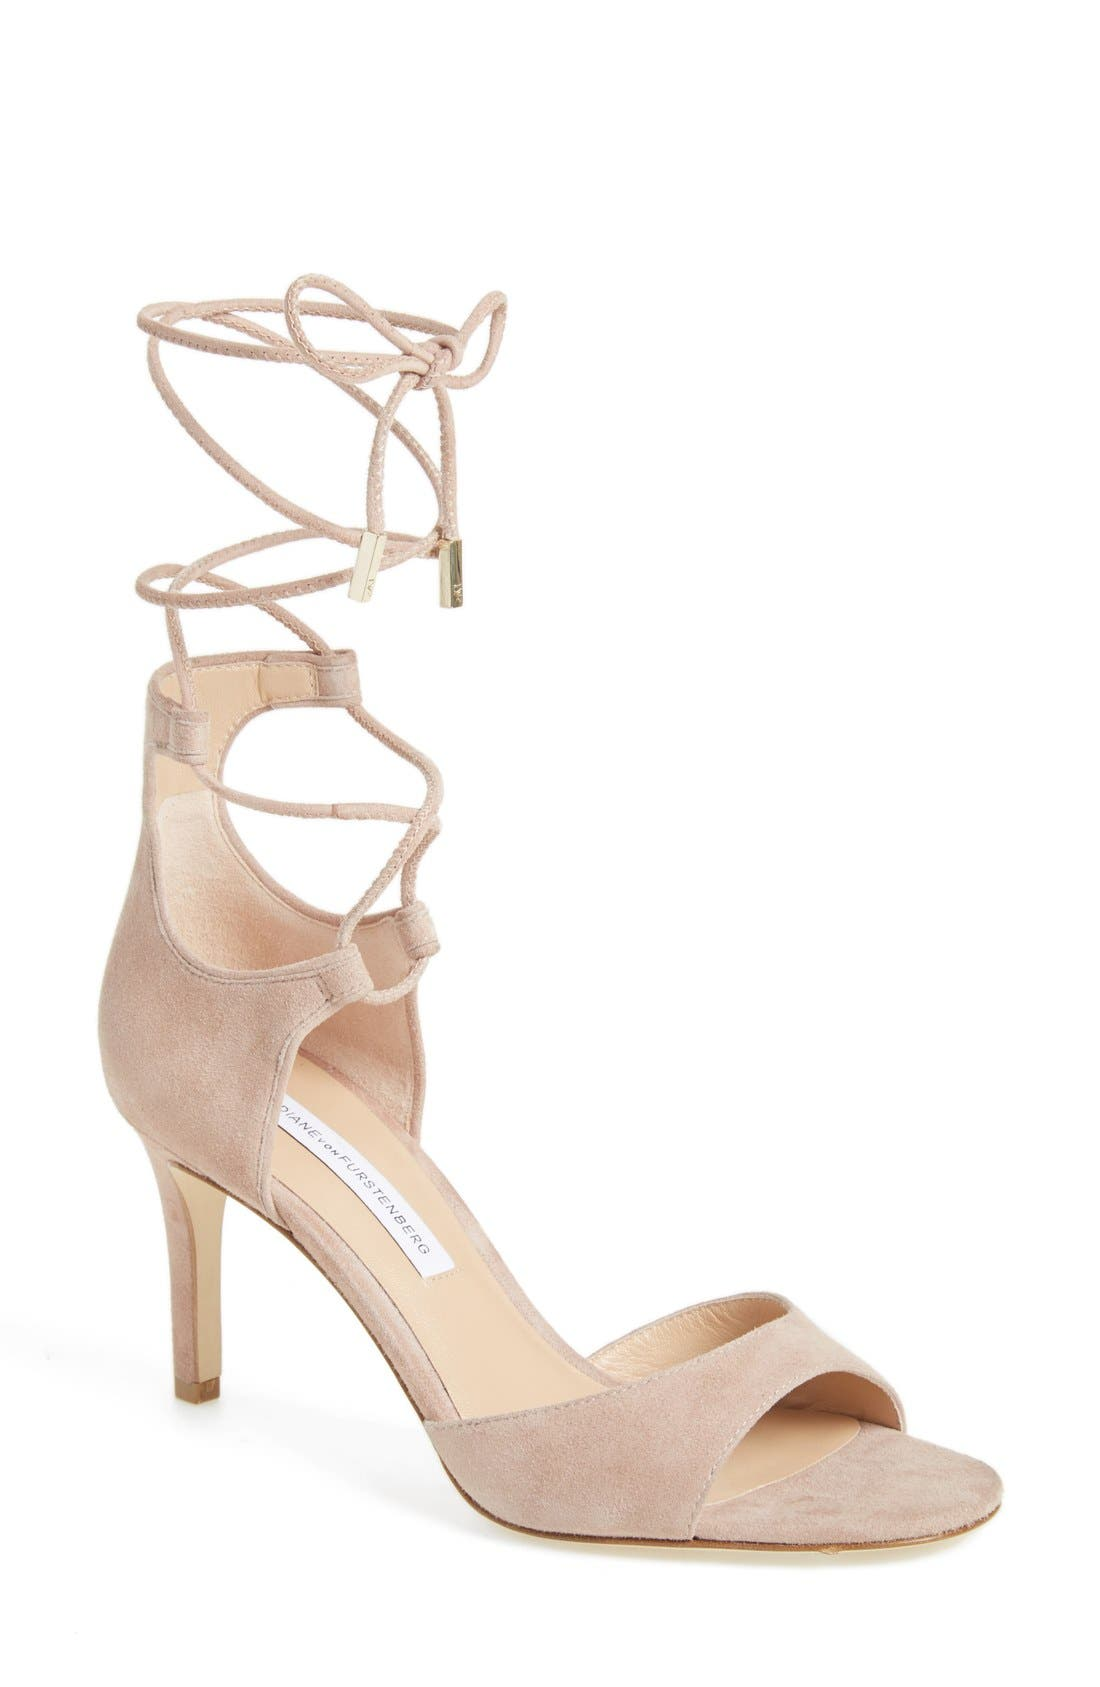 DIANE VON FURSTENBERG 'Rimini' Ankle Wrap Sandal